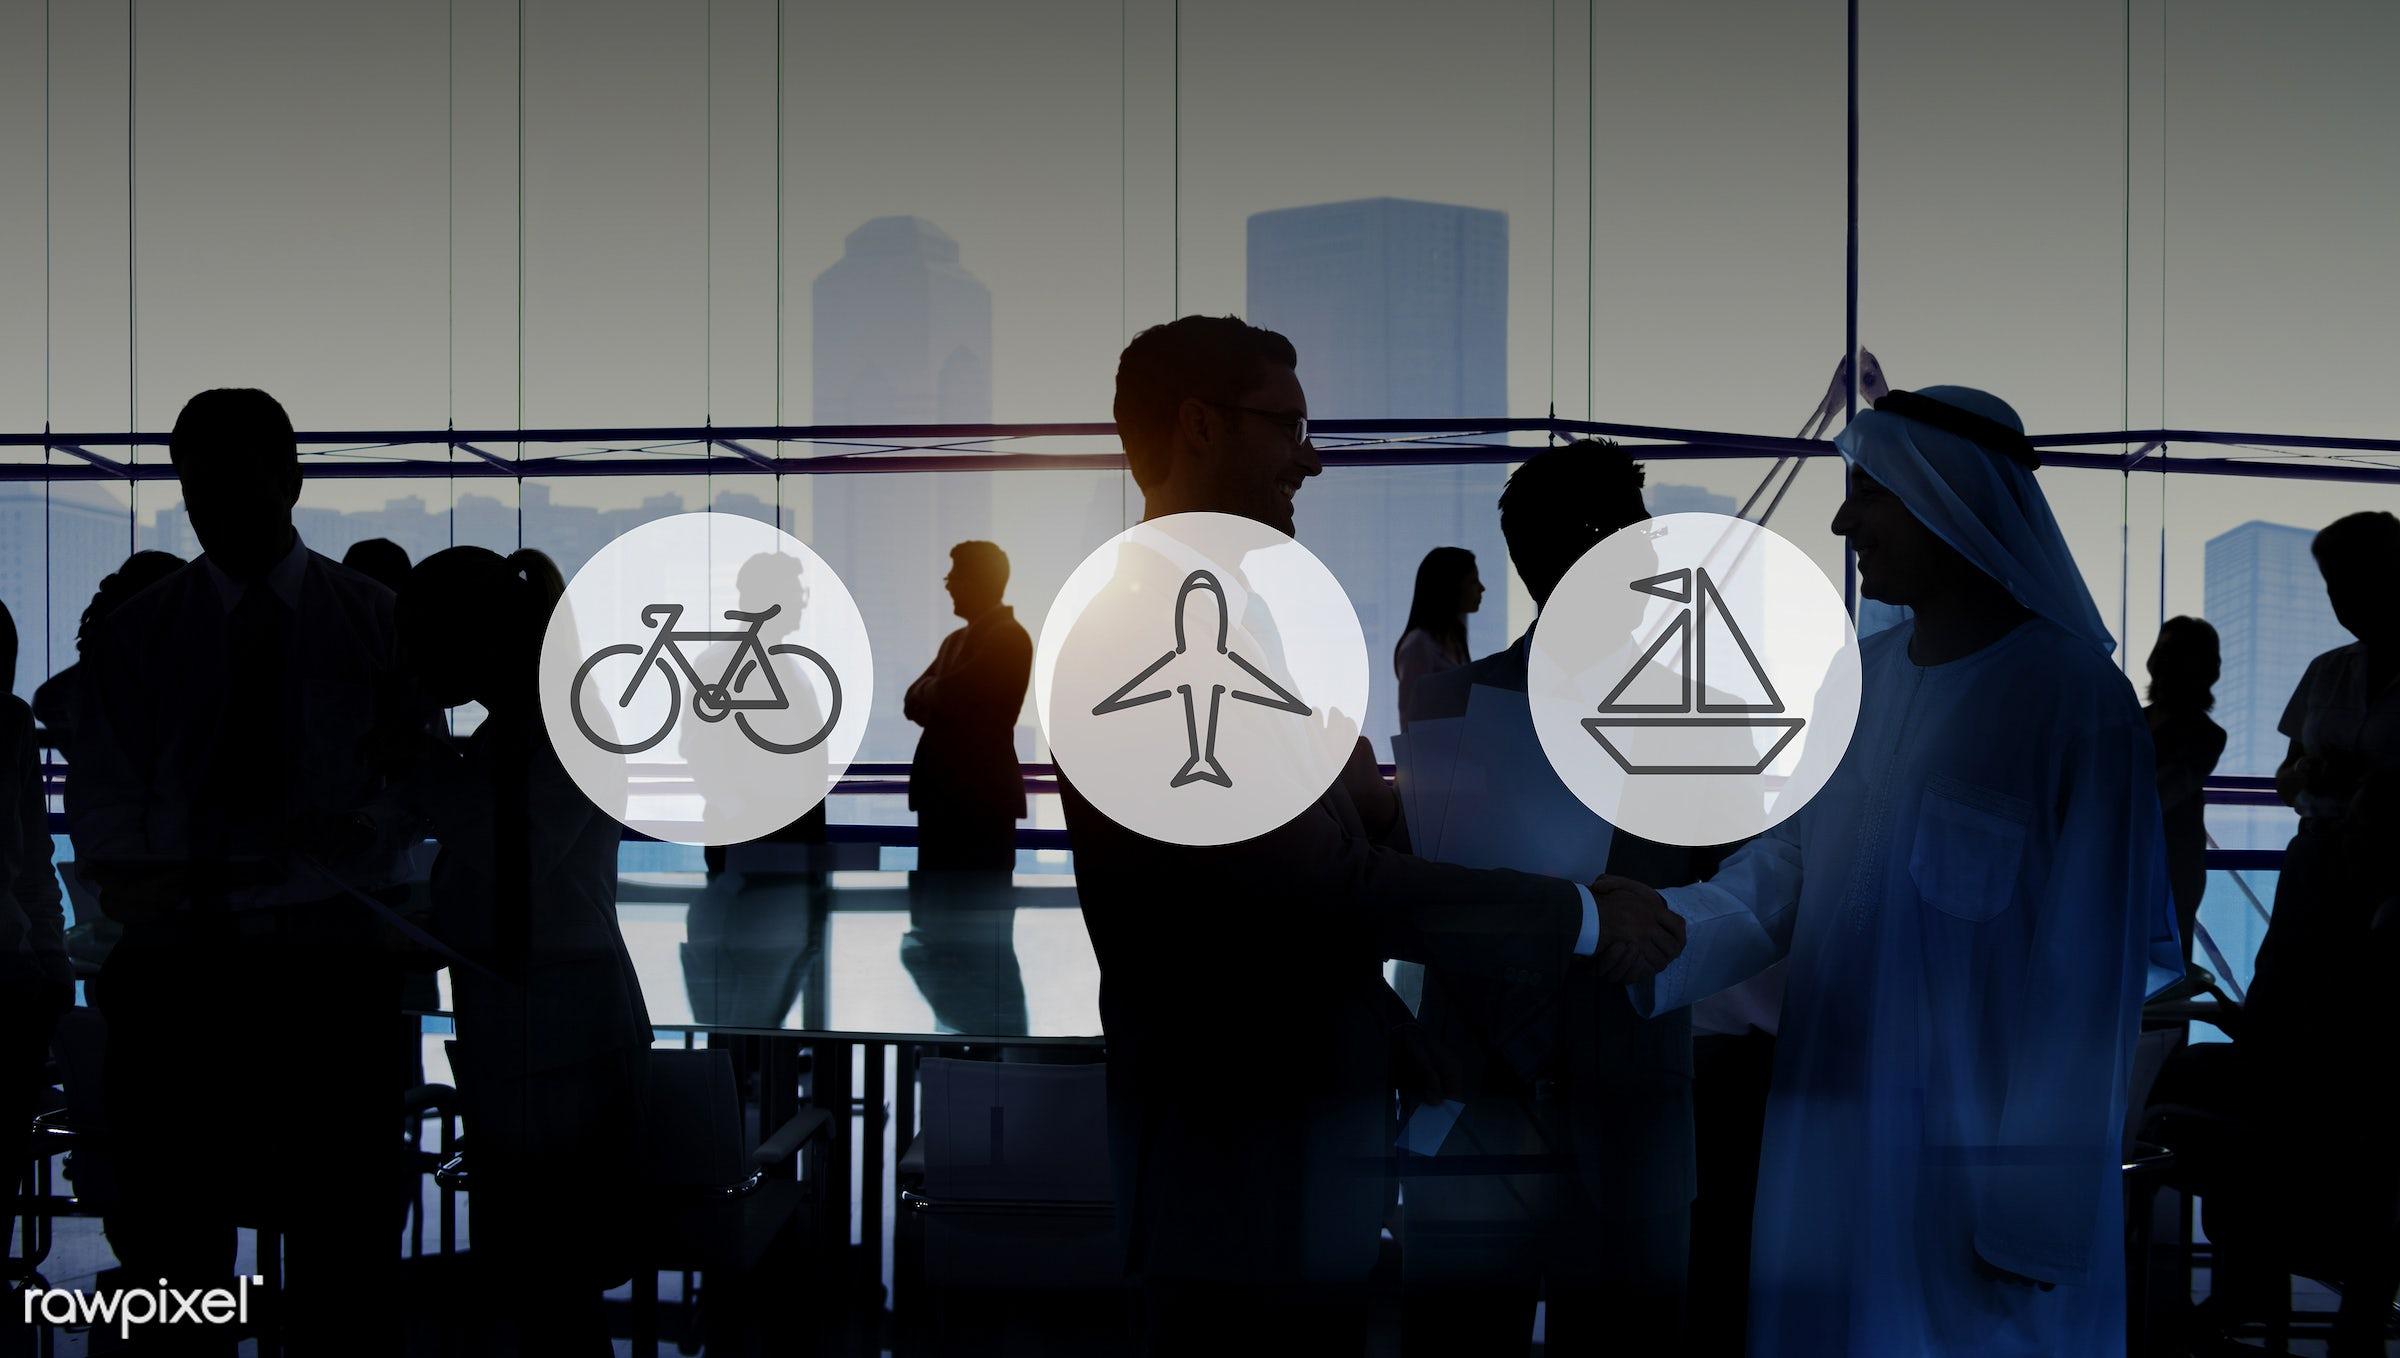 industry, agreement, air, airplane, back lit, bicycle, bike, brainstorming, business people, businessmen, businesswomen,...